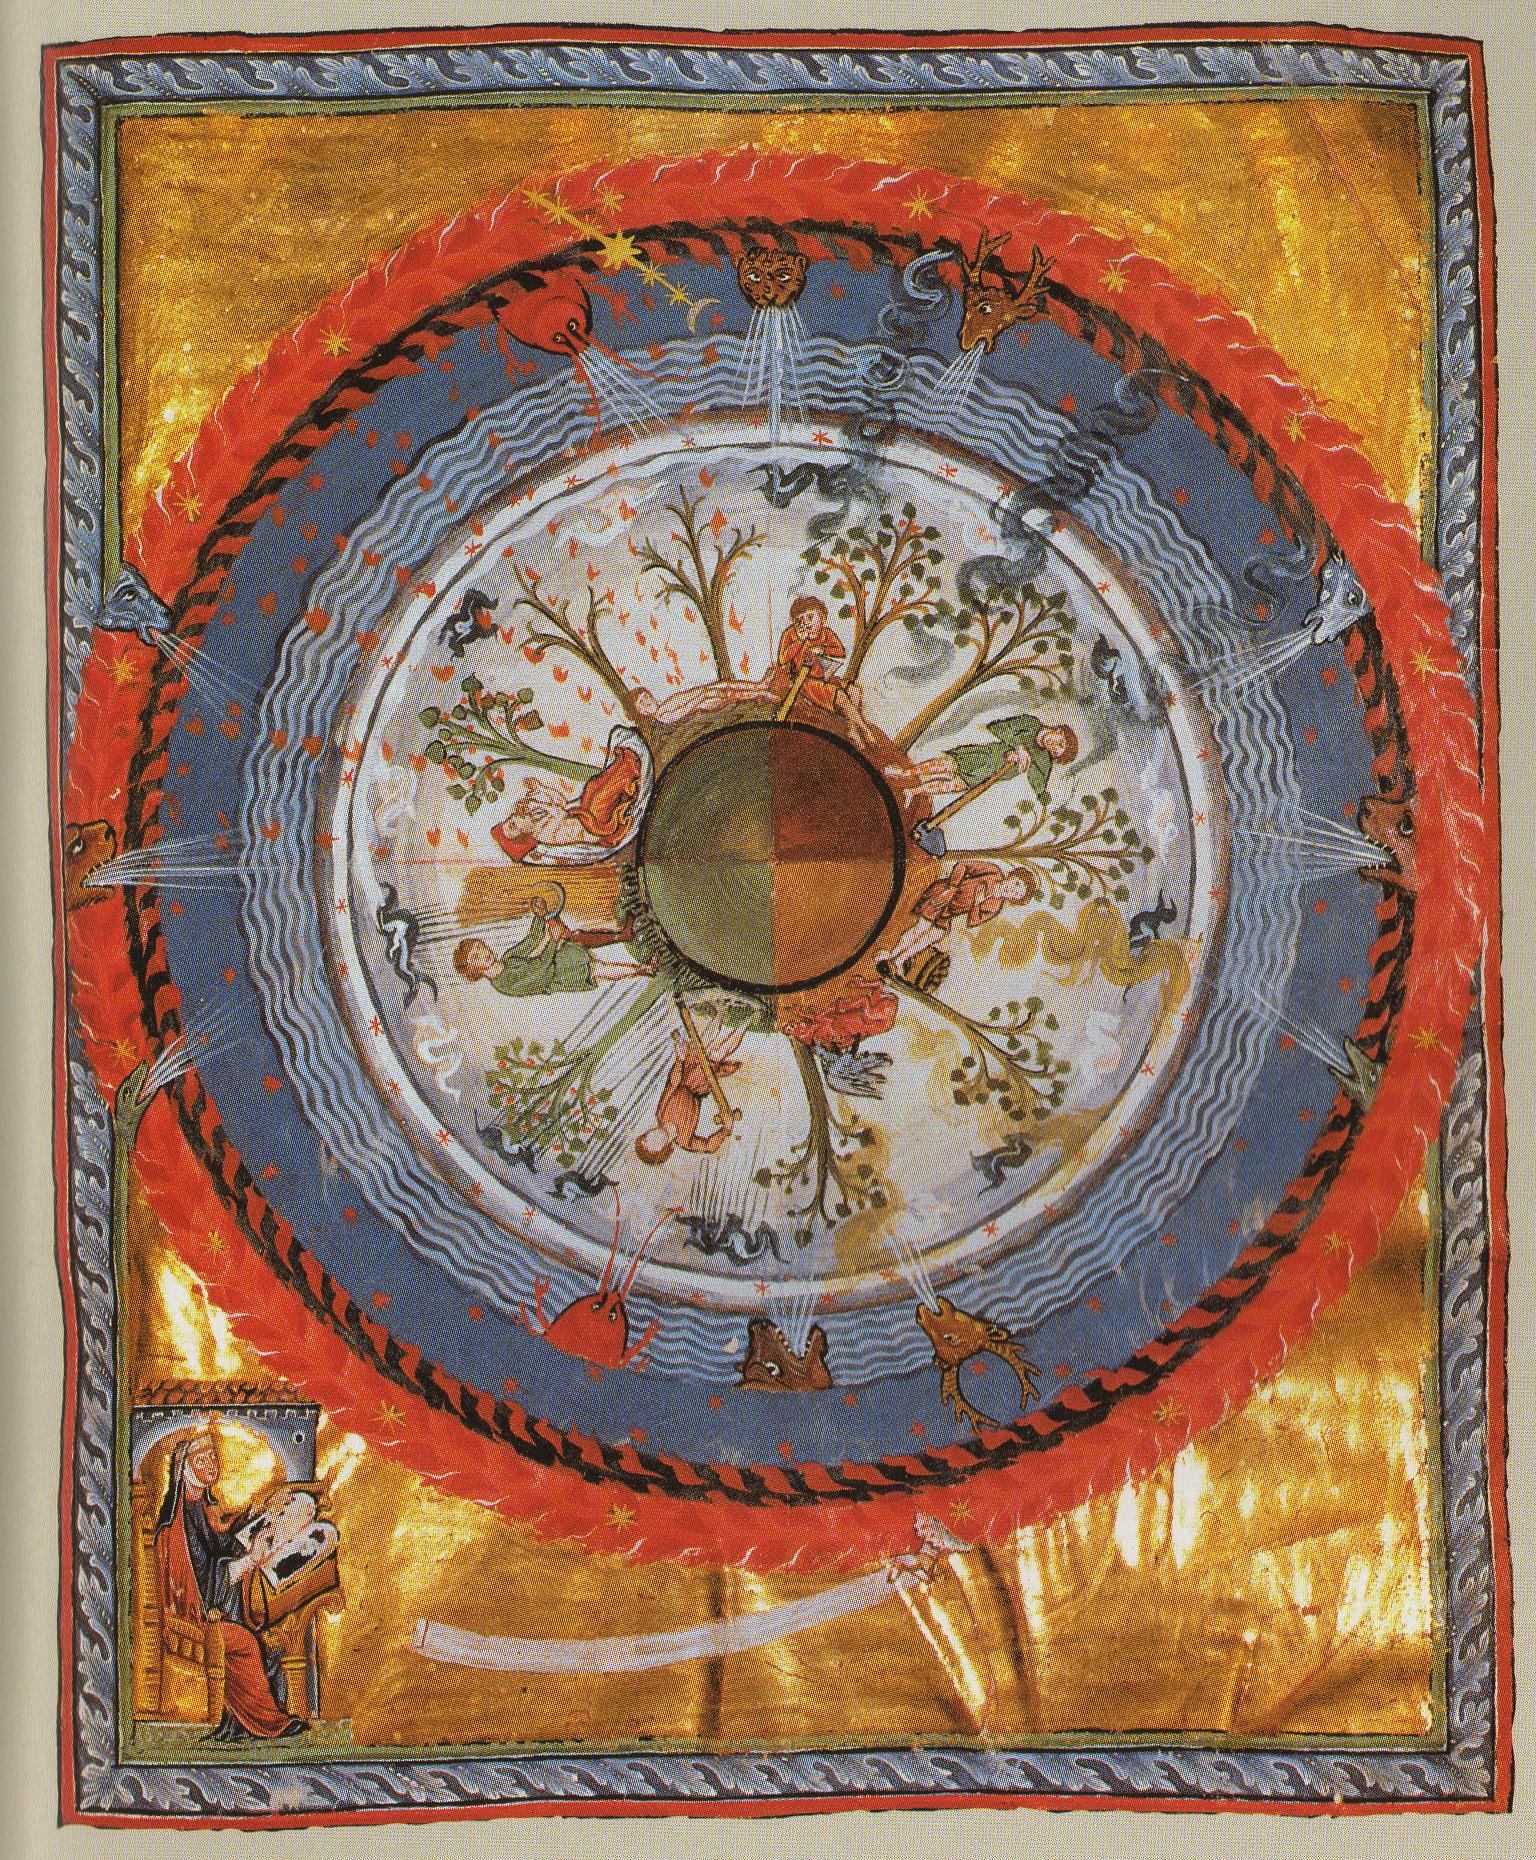 Liber Divinorum Operum:Fourth Vision, 1173